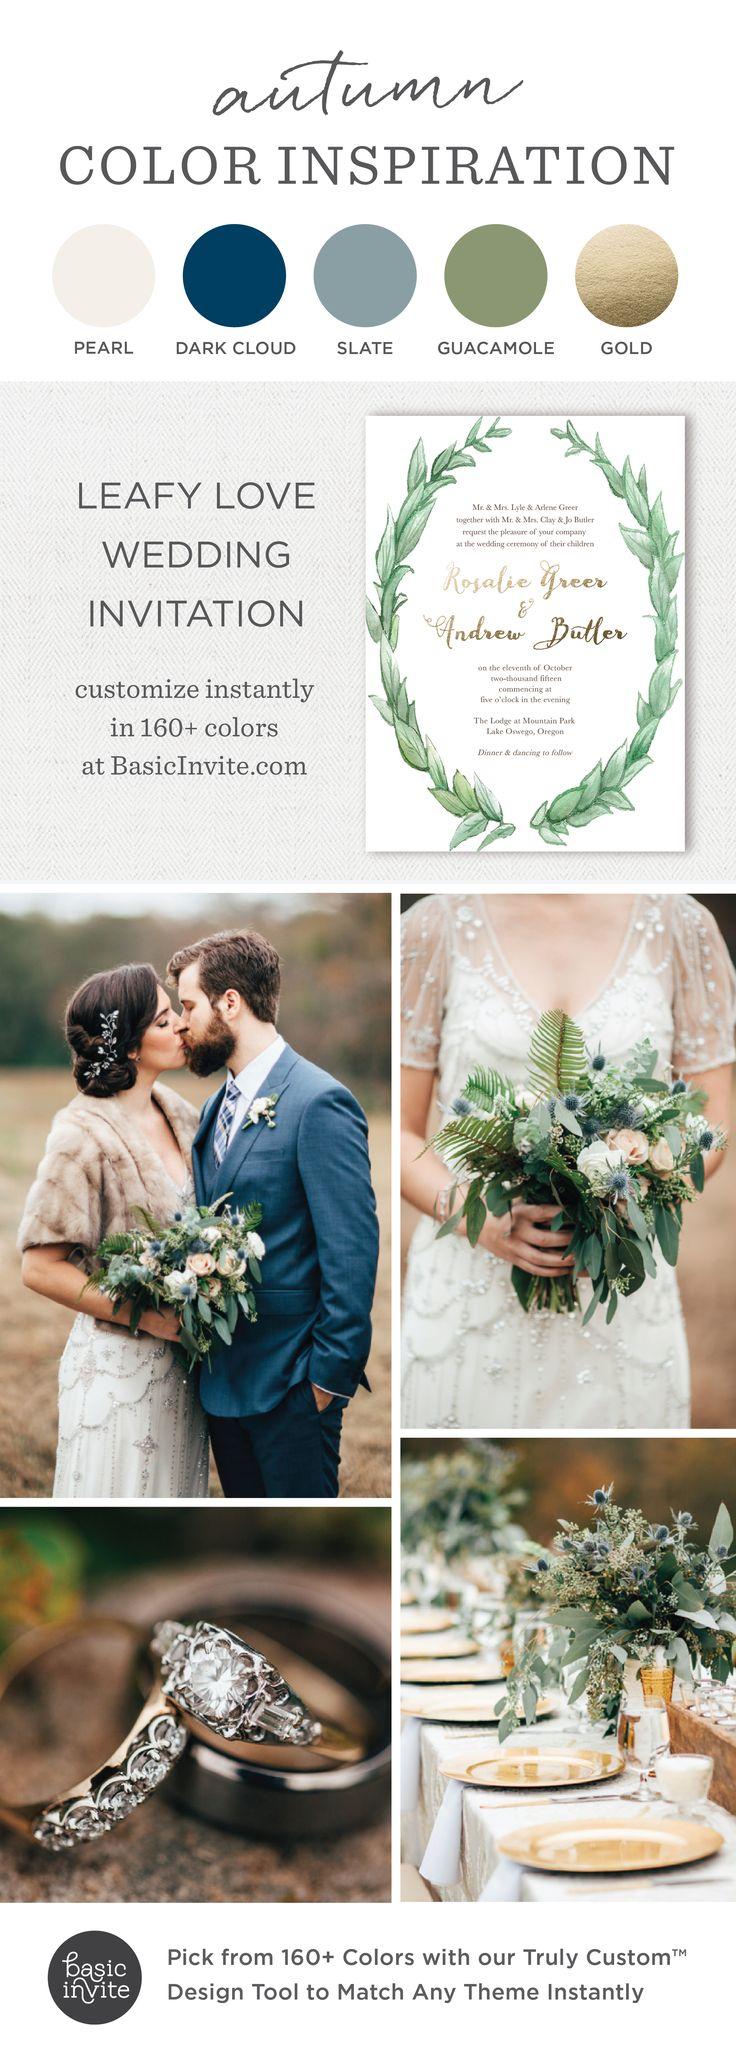 The Leafy Love Wedding Invitation